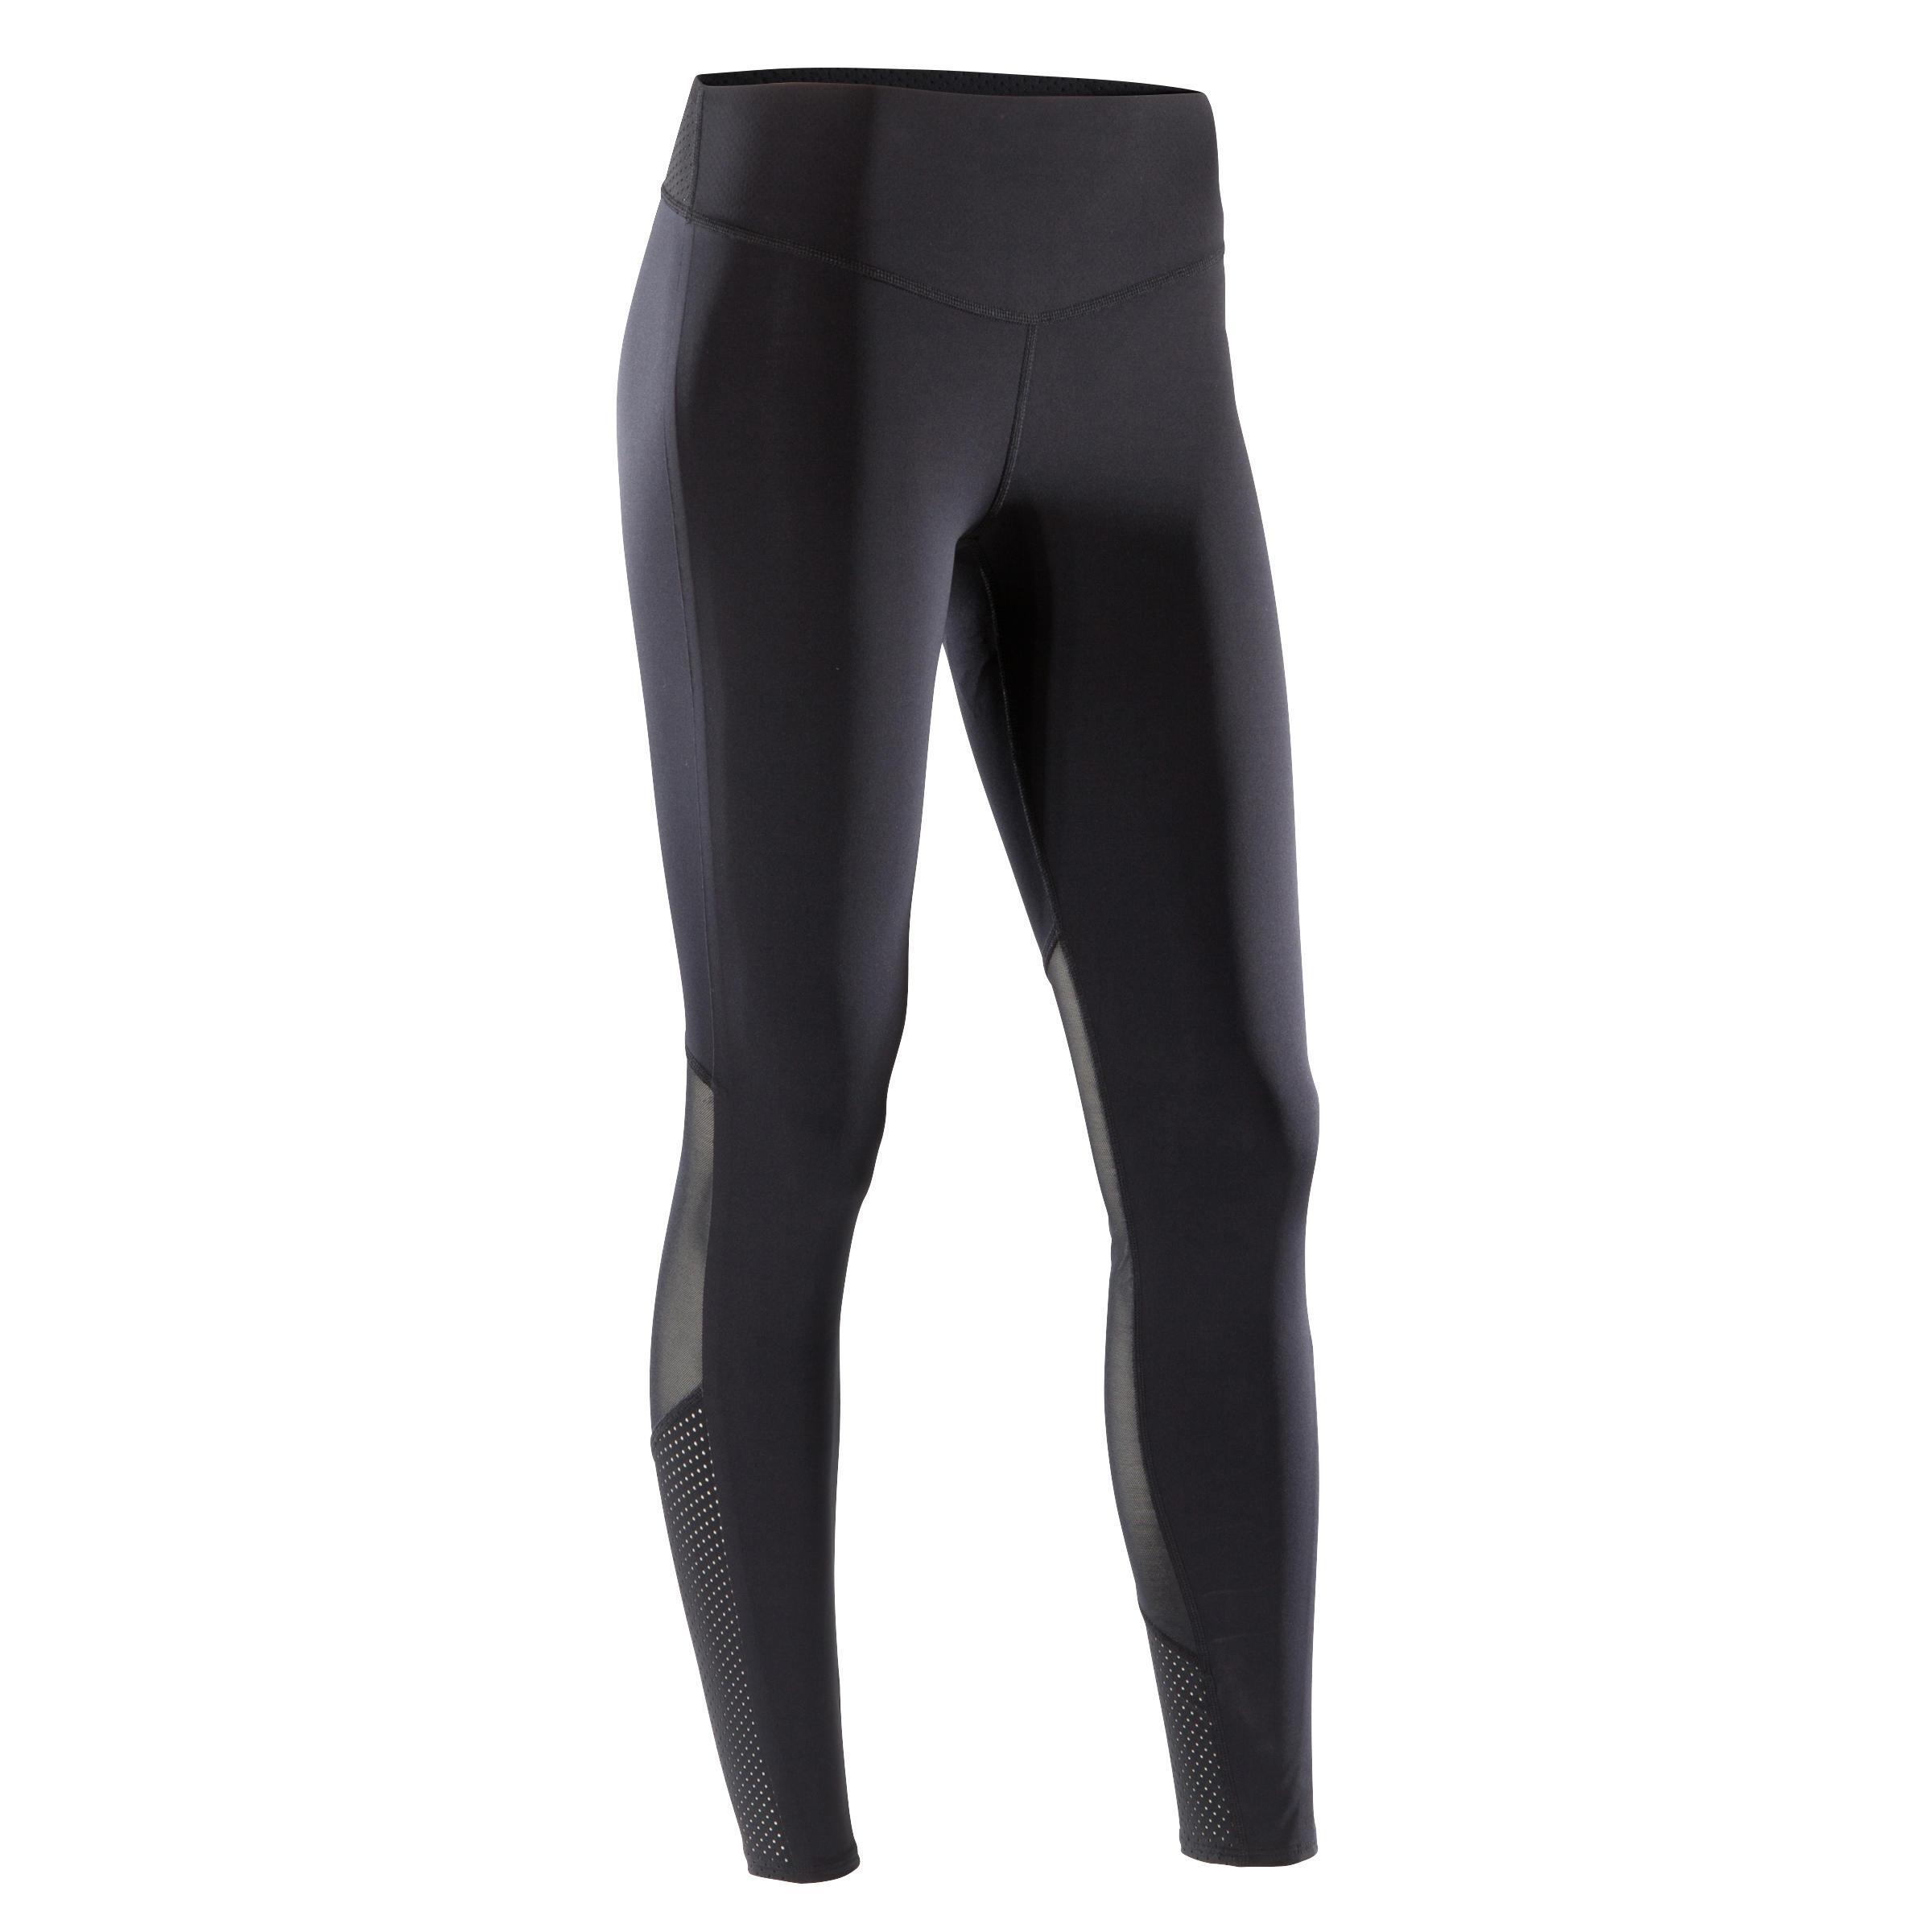 900 Women's Cardio Fitness Leggings - Black